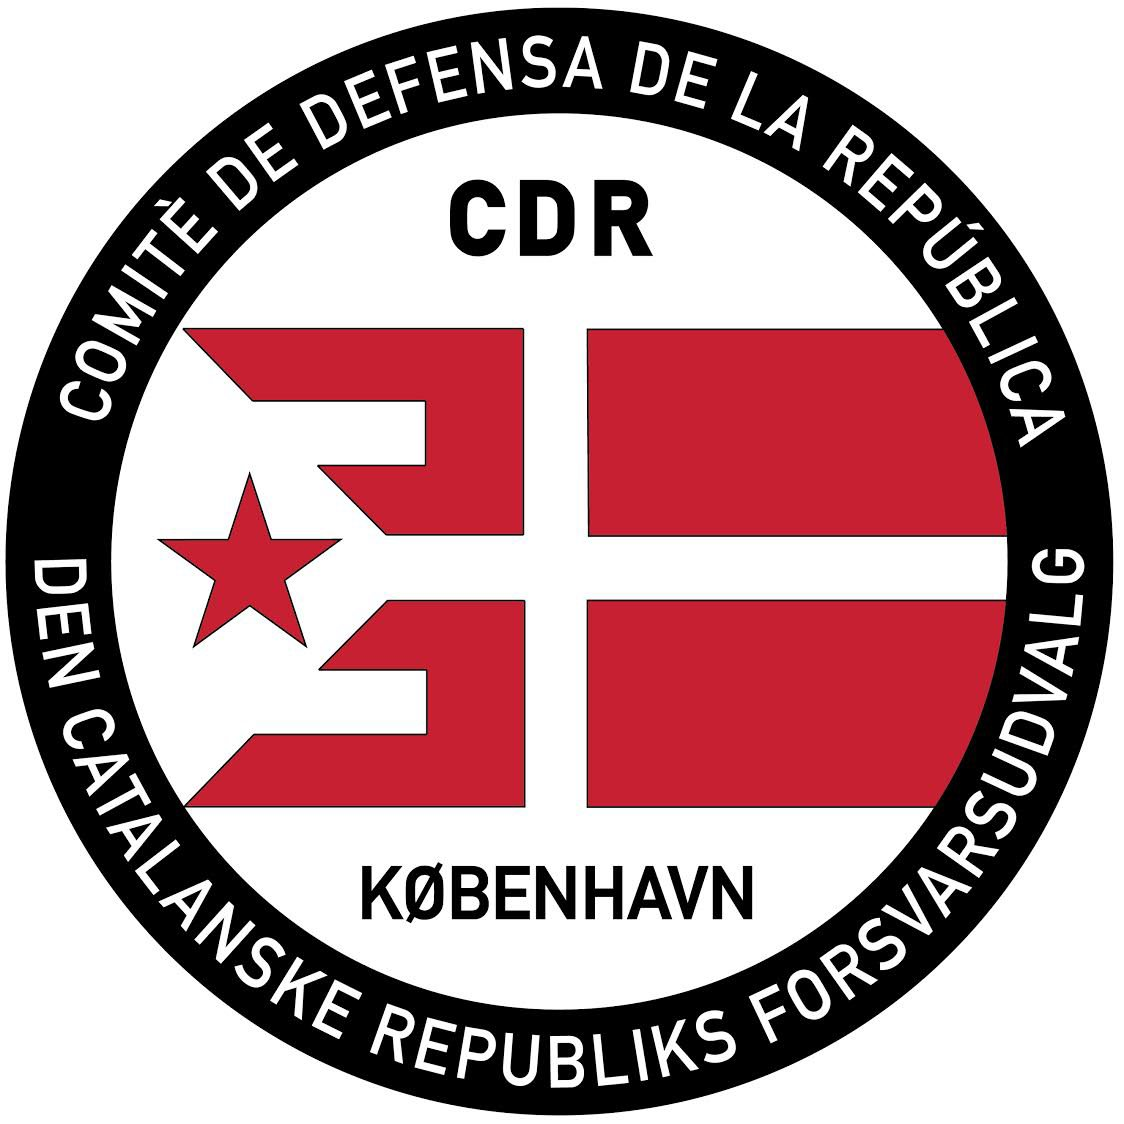 CDR København (@cdrcopenhagen)...